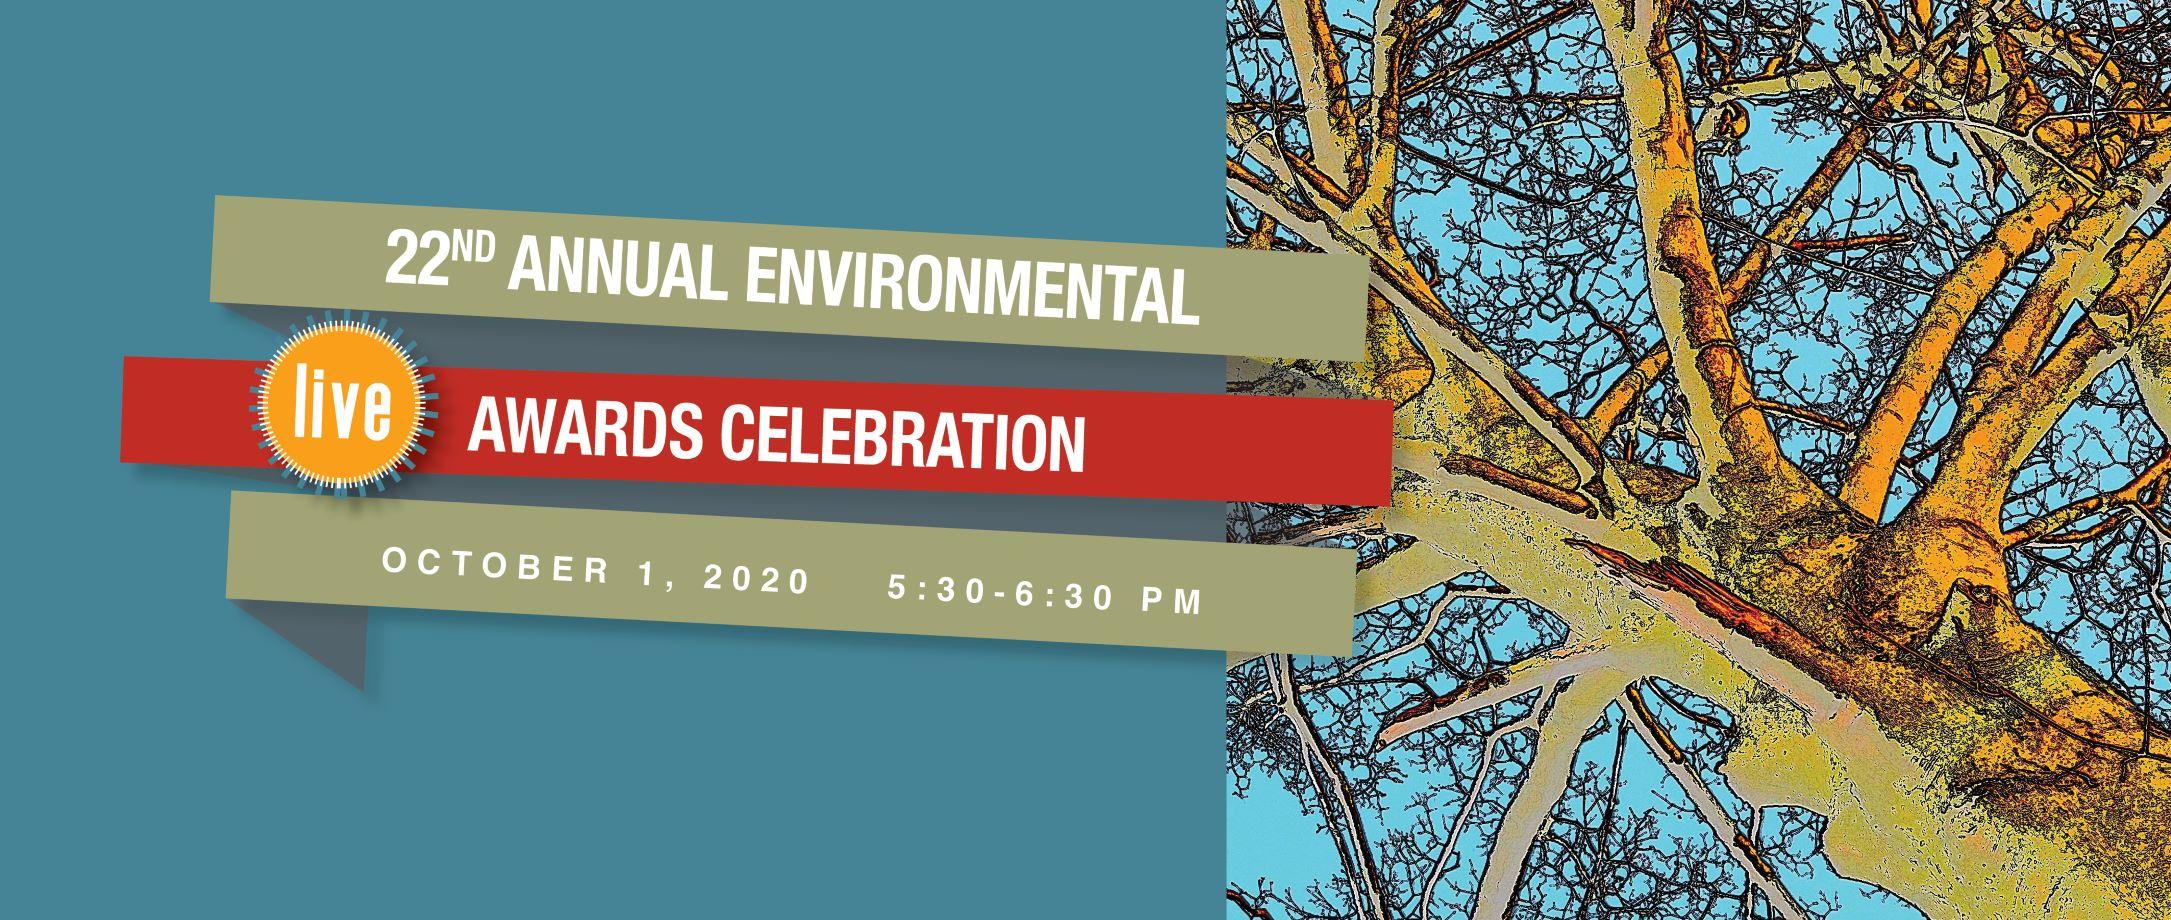 22nd Annual Environmental Awards Celebration